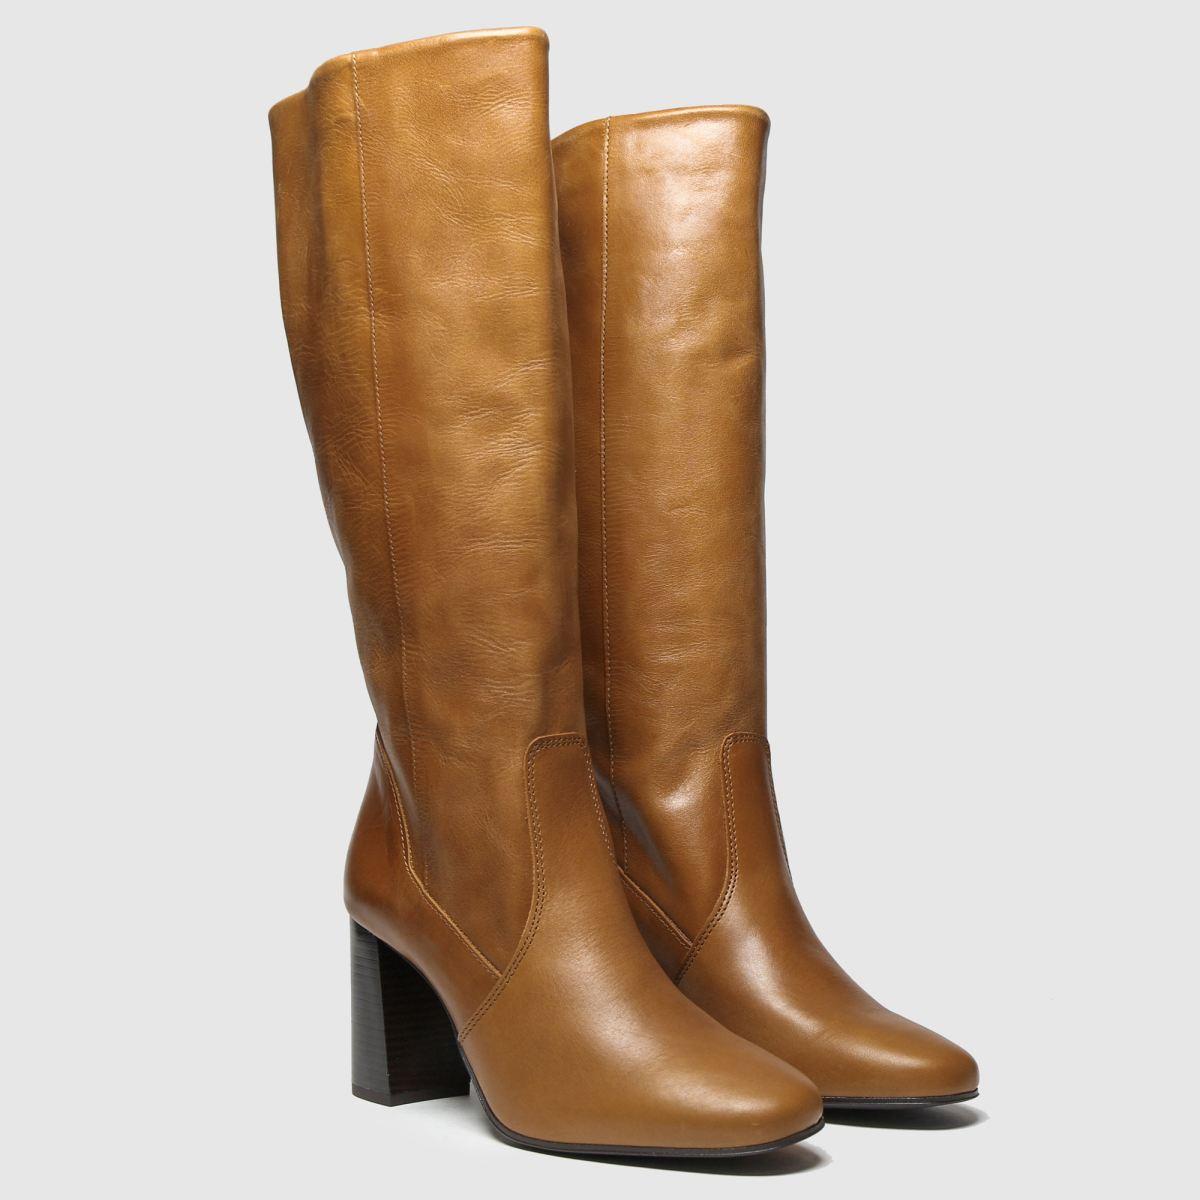 Schuh Tan Enchanter Boots £100